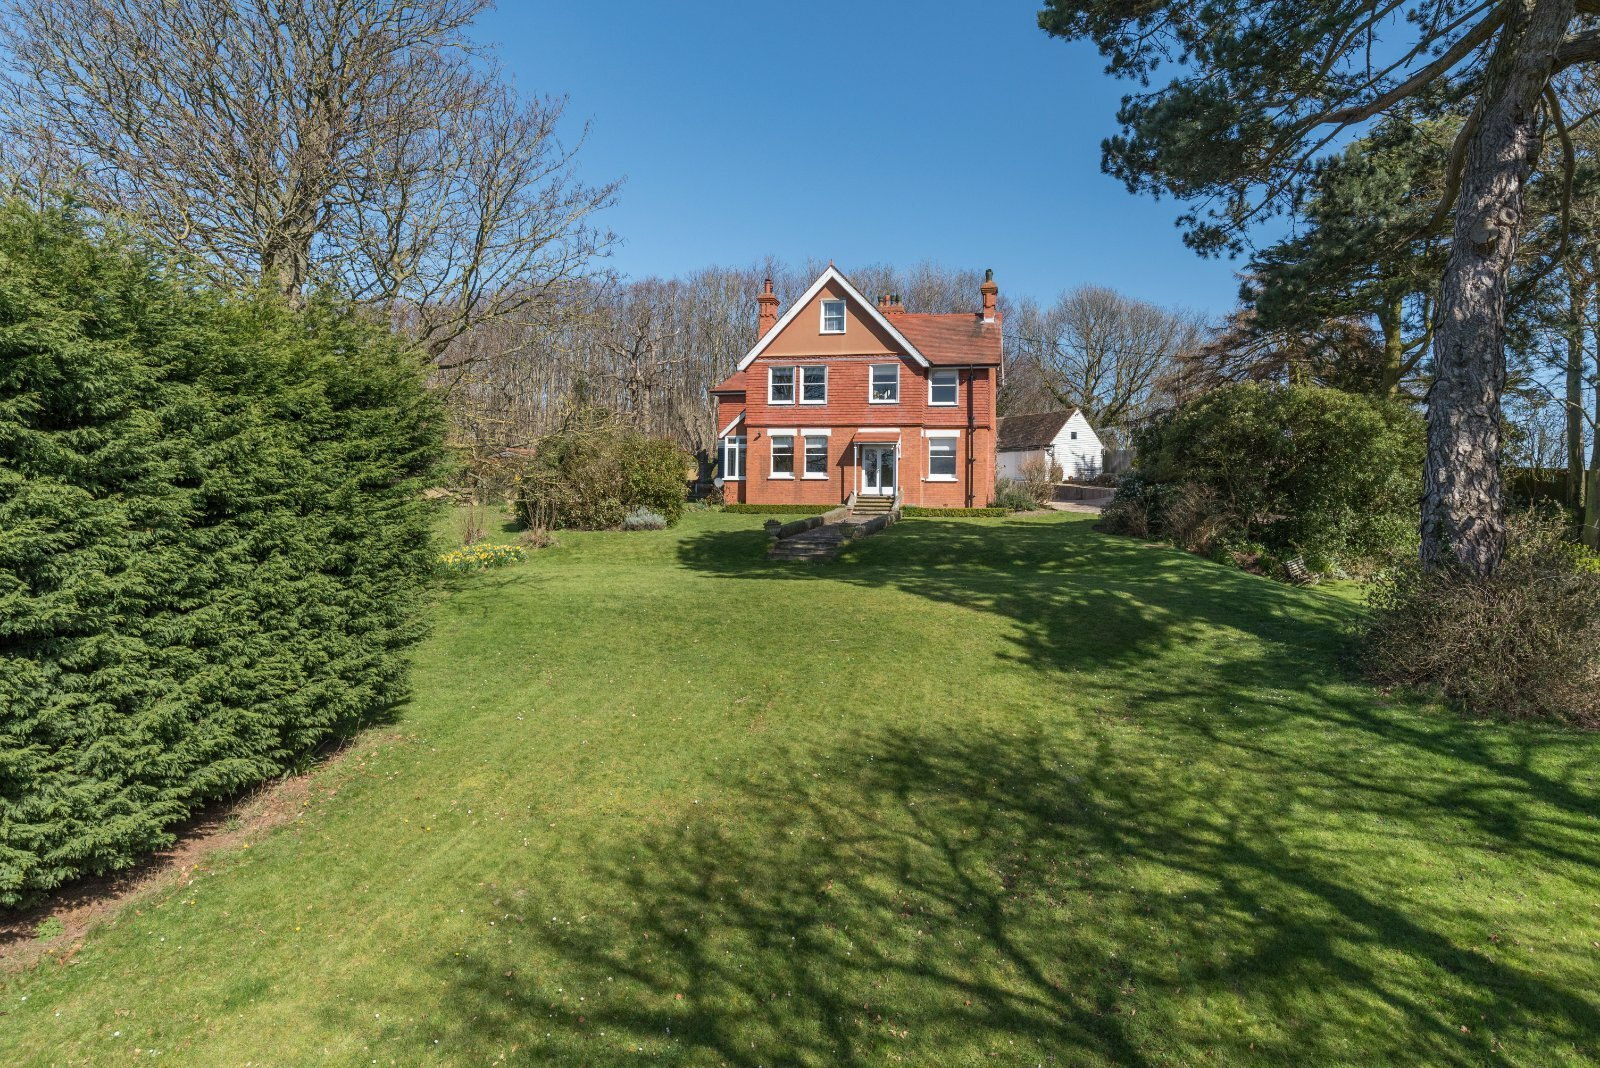 House in Wingham, England, United Kingdom 1